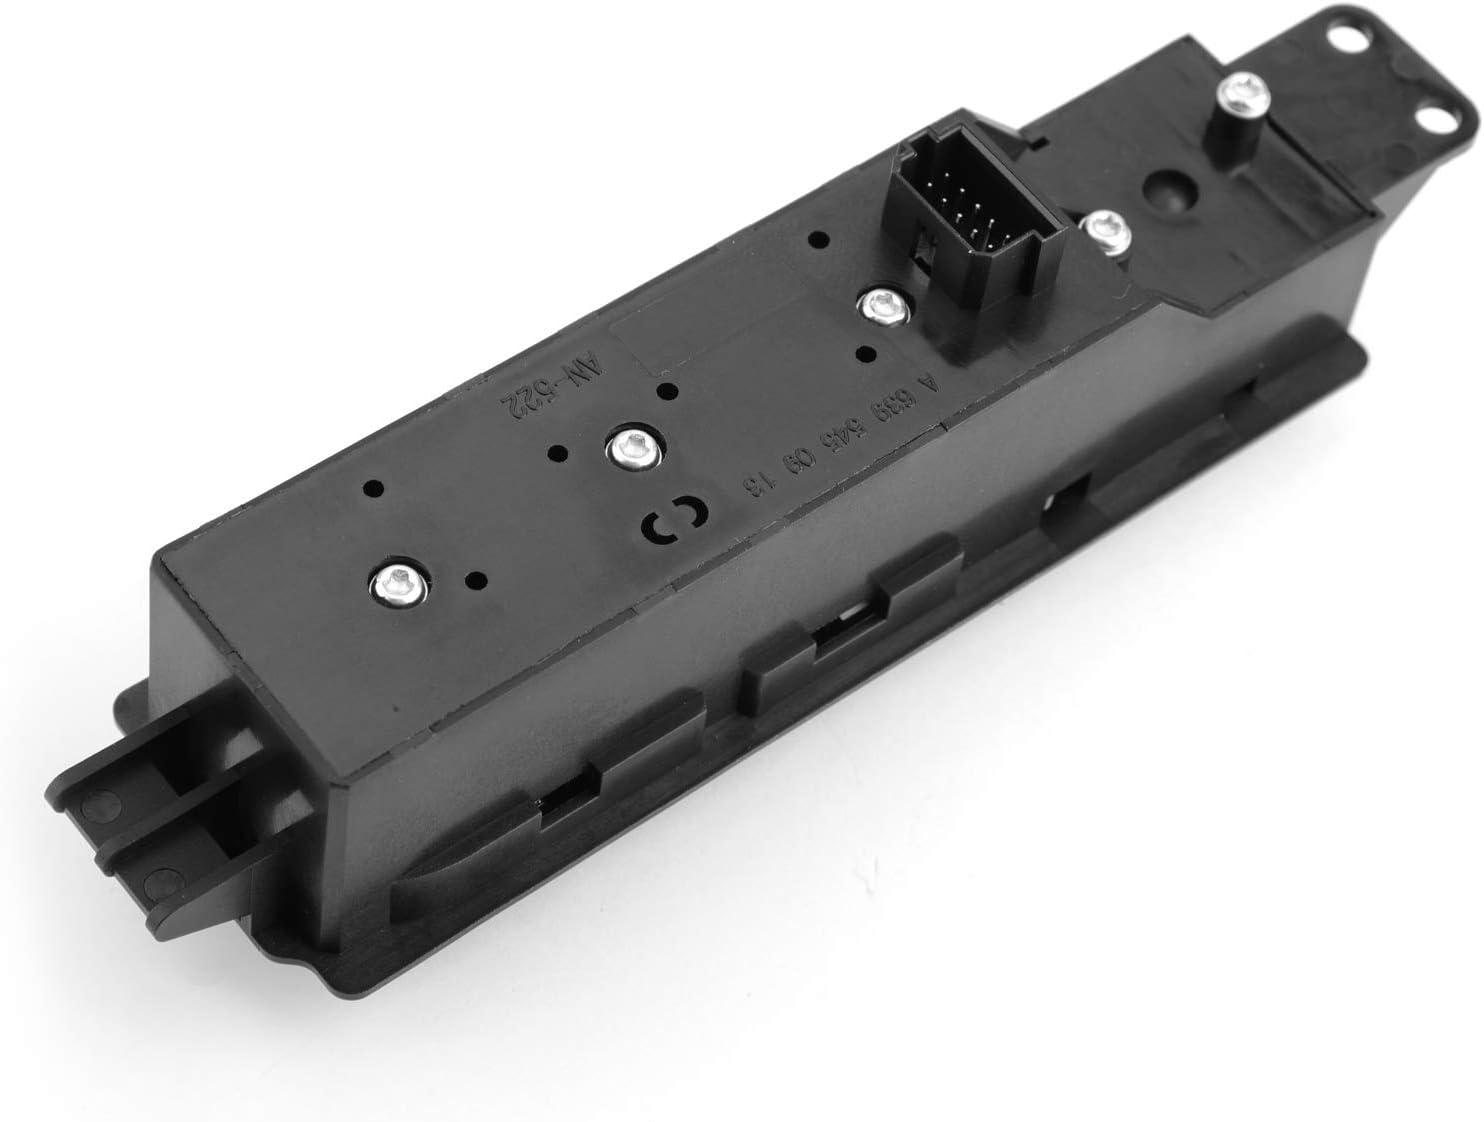 Artudatech Car Window Control Switch Electric Driver Side Master Power Window Control Switch for Merce-des Ben-z Viano Vito W639